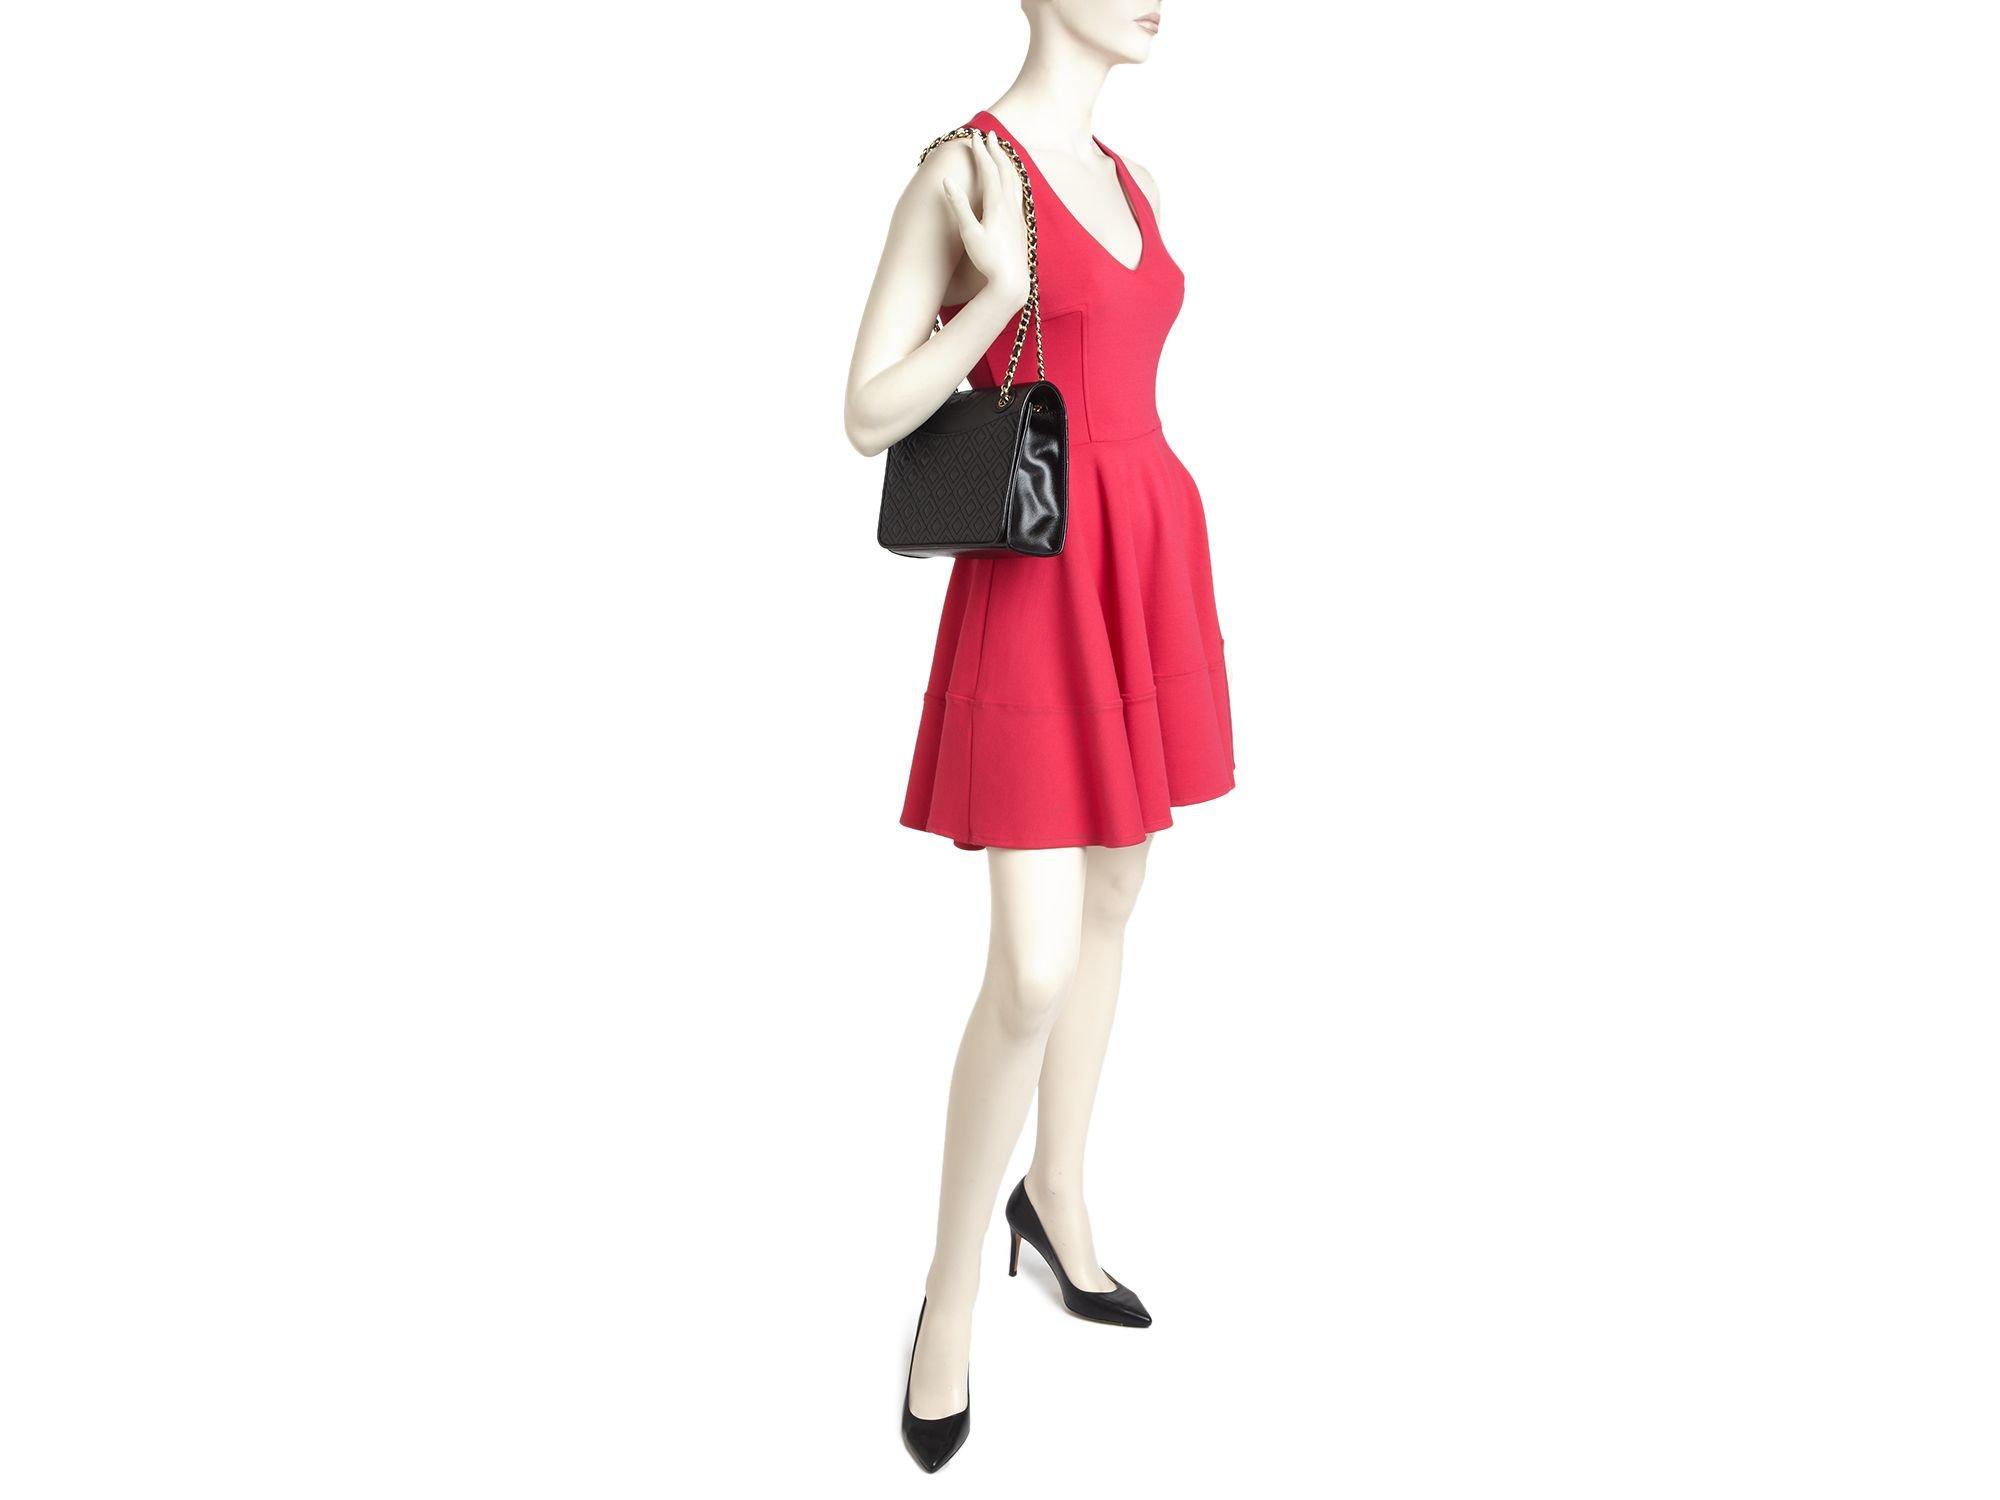 9ff4fa5b1ba5 Lyst - Tory Burch Shoulder Bag - Fleming Patent Medium in Black